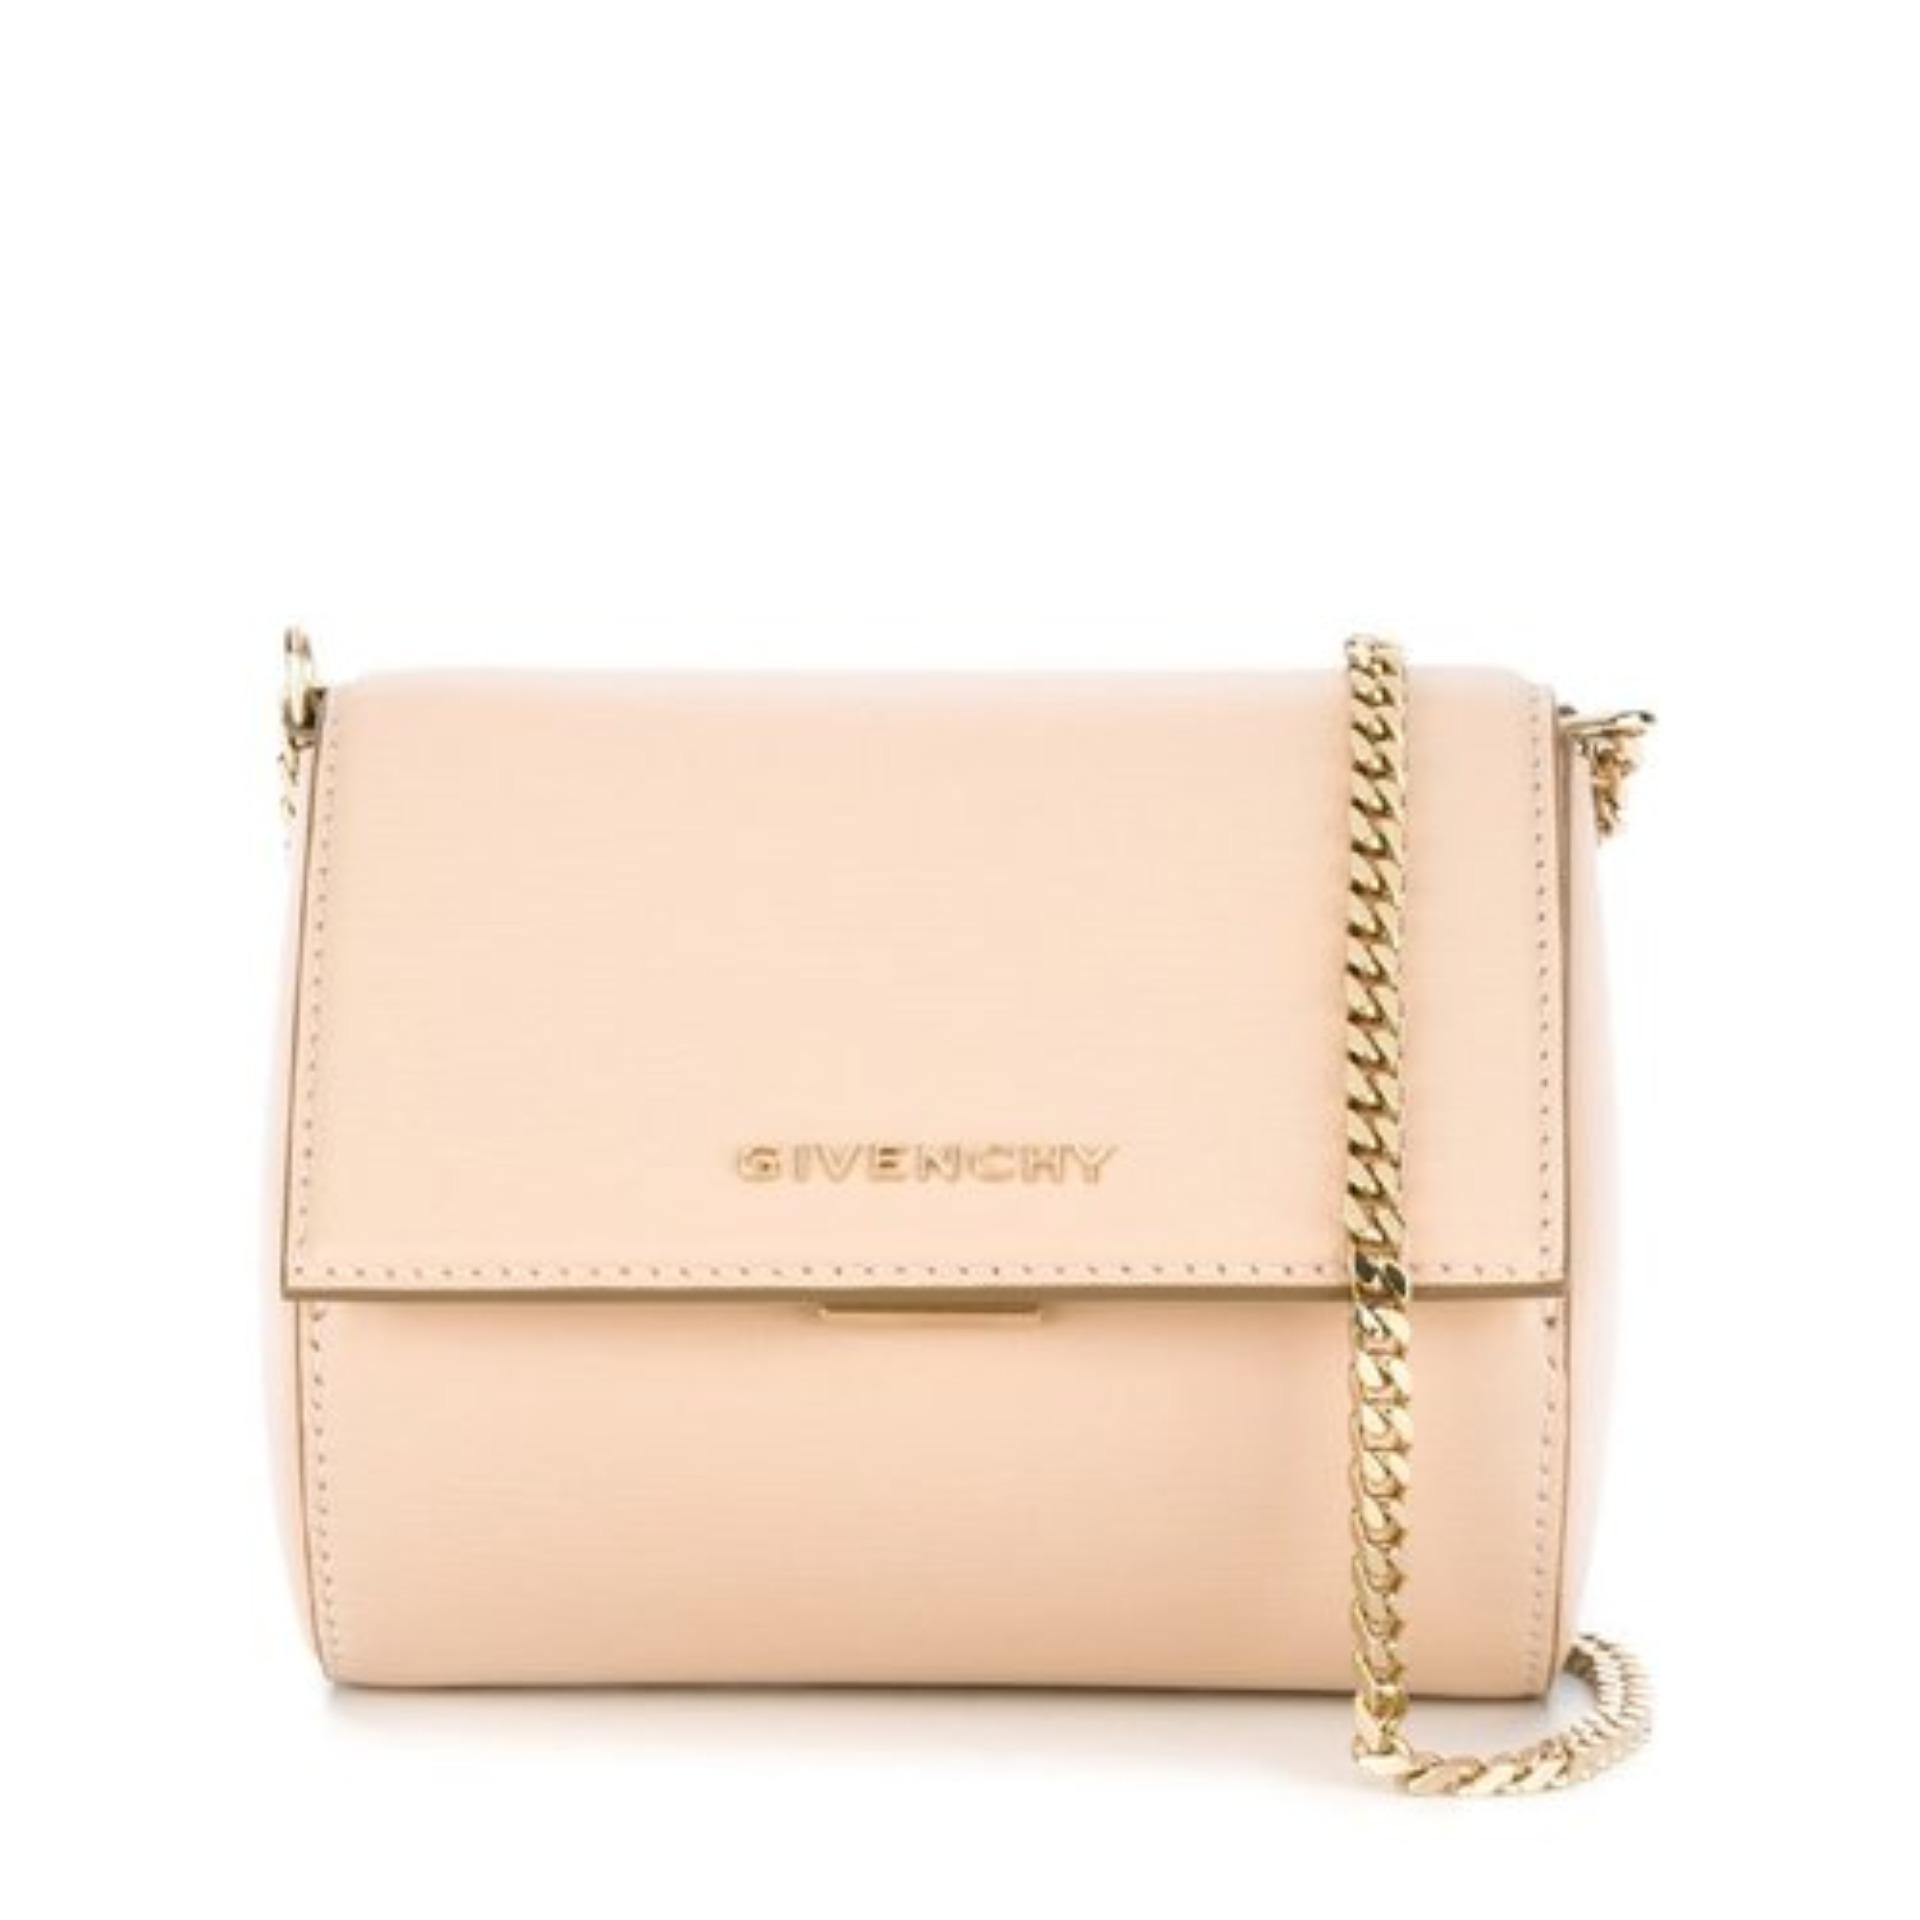 Givenchy Micro Pandora Box Chain (Nude Pink)   BB05265006657 4e601290bd4f7